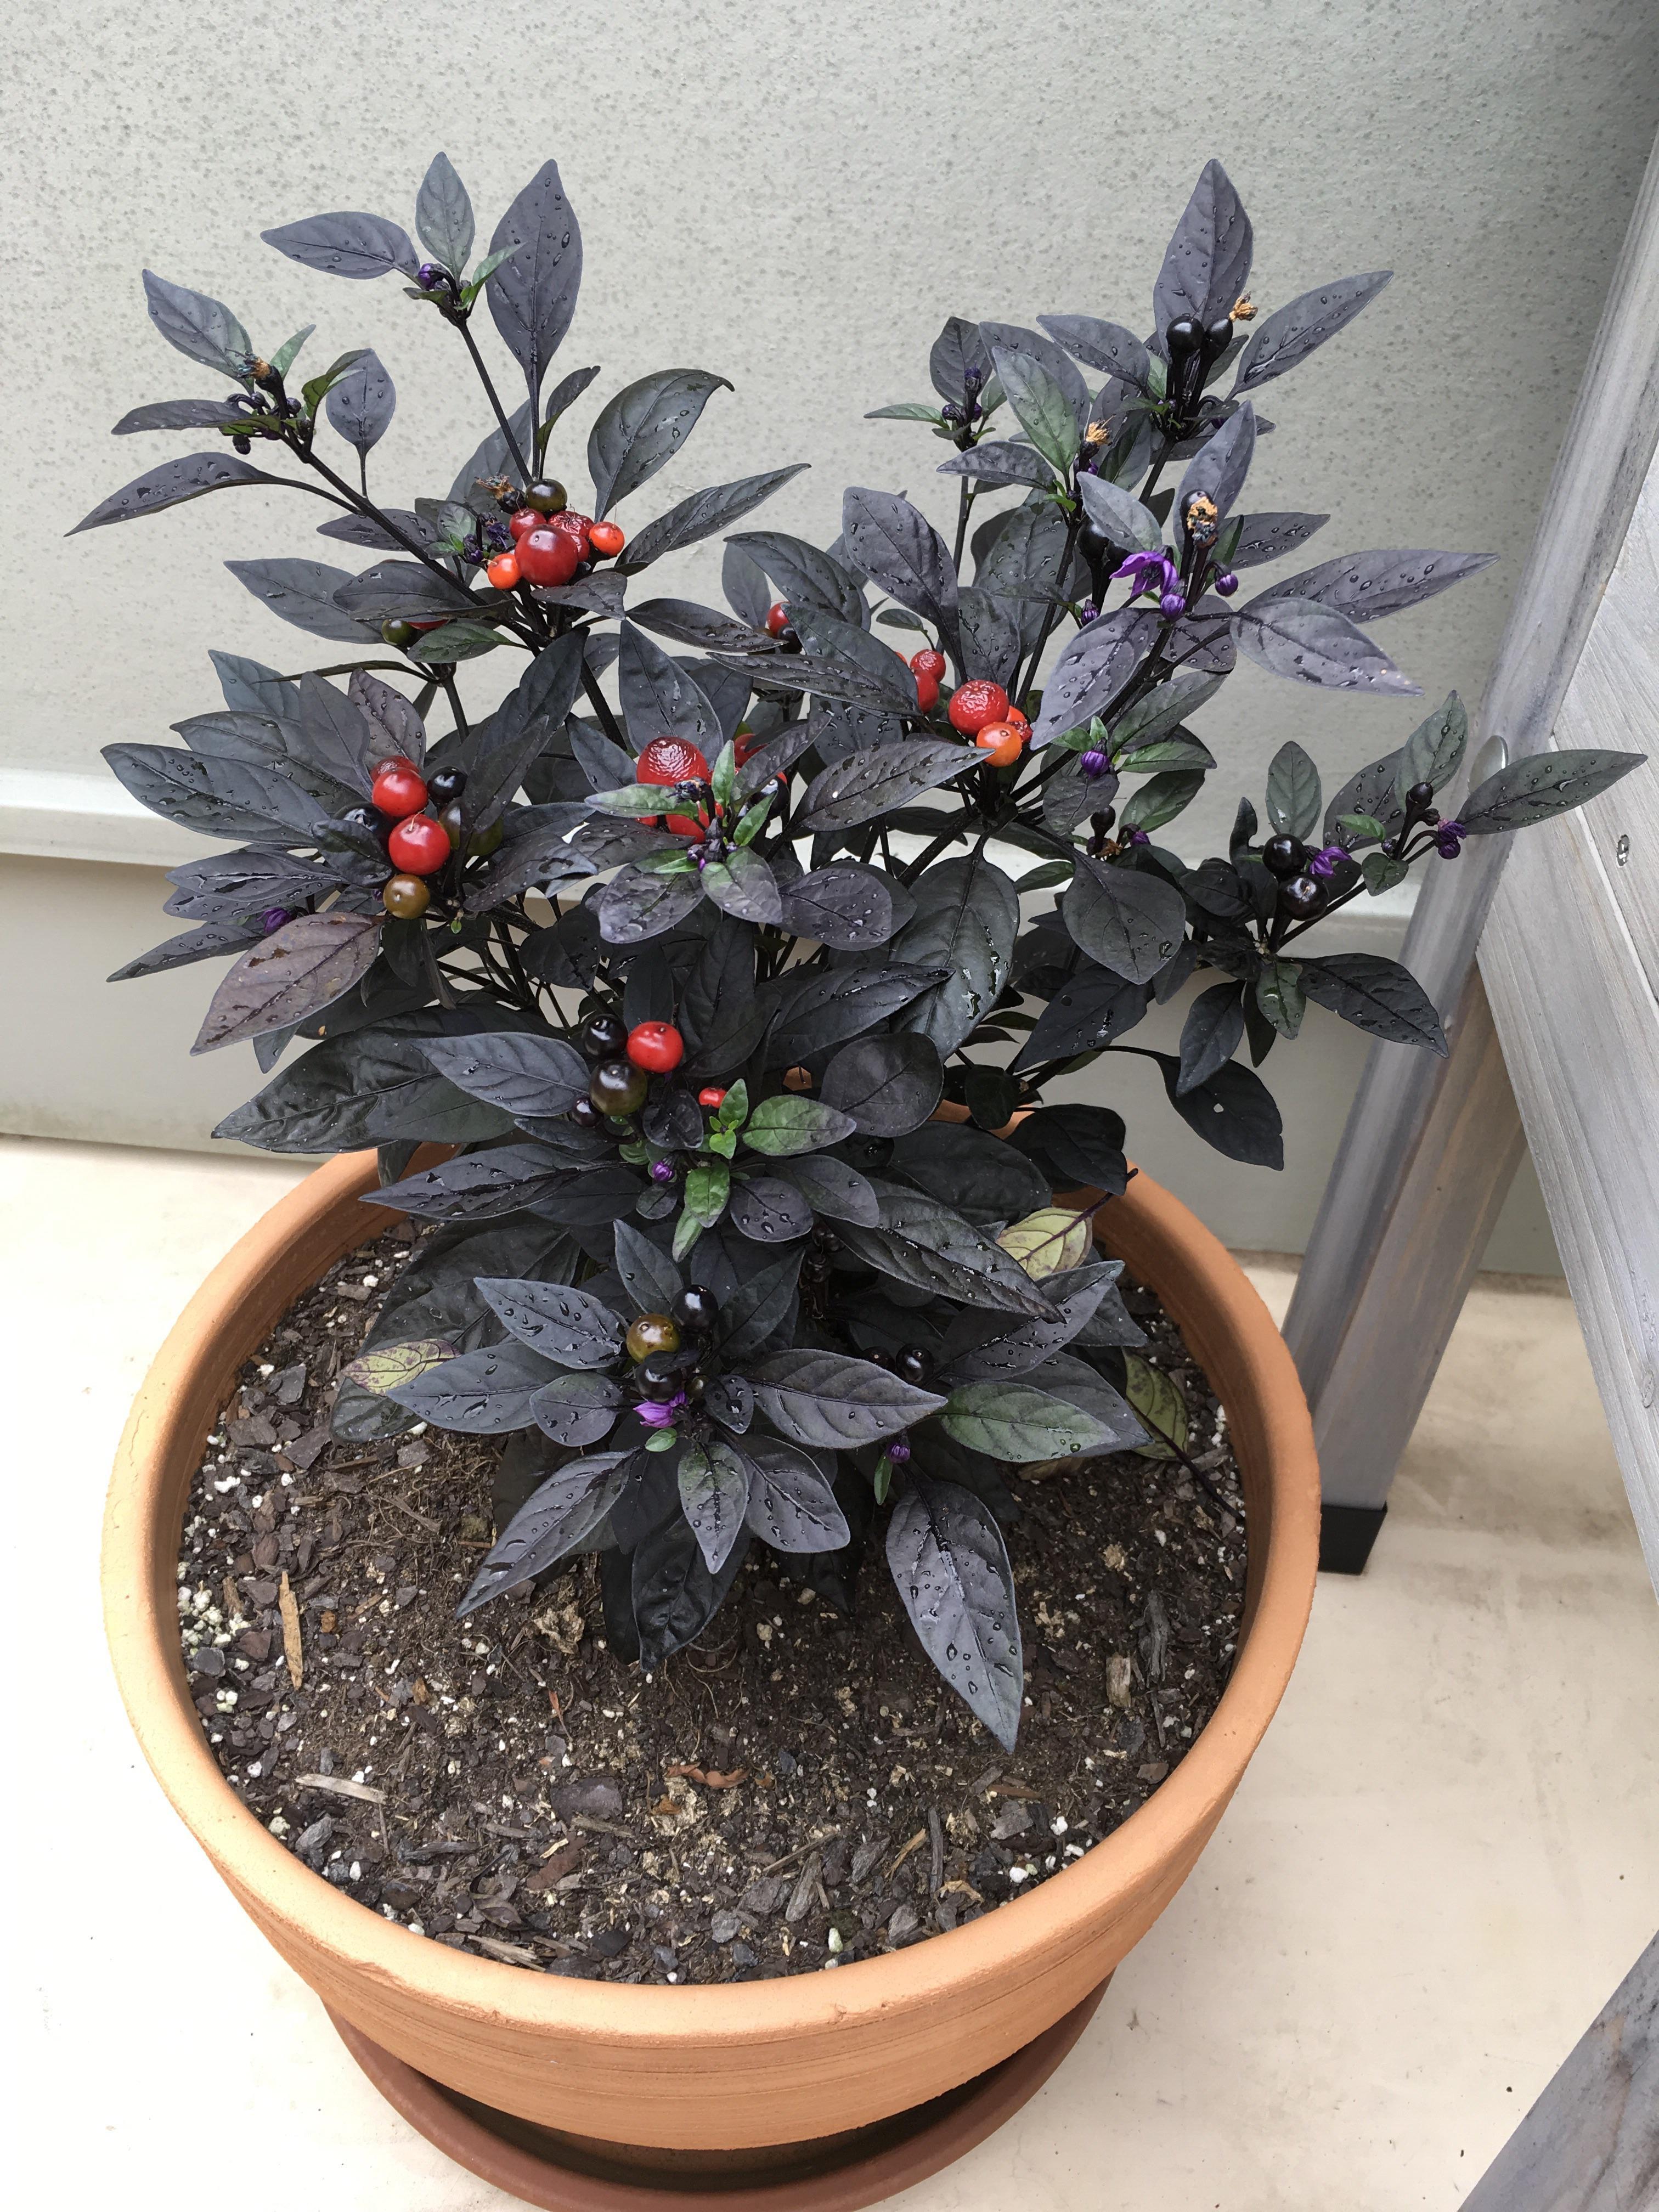 Astounding Black Pearl Very Black Pearl Very Hotpeppers Black Pearl Pepper Plants Black Pearl Pepper Uses houzz-02 Black Pearl Pepper